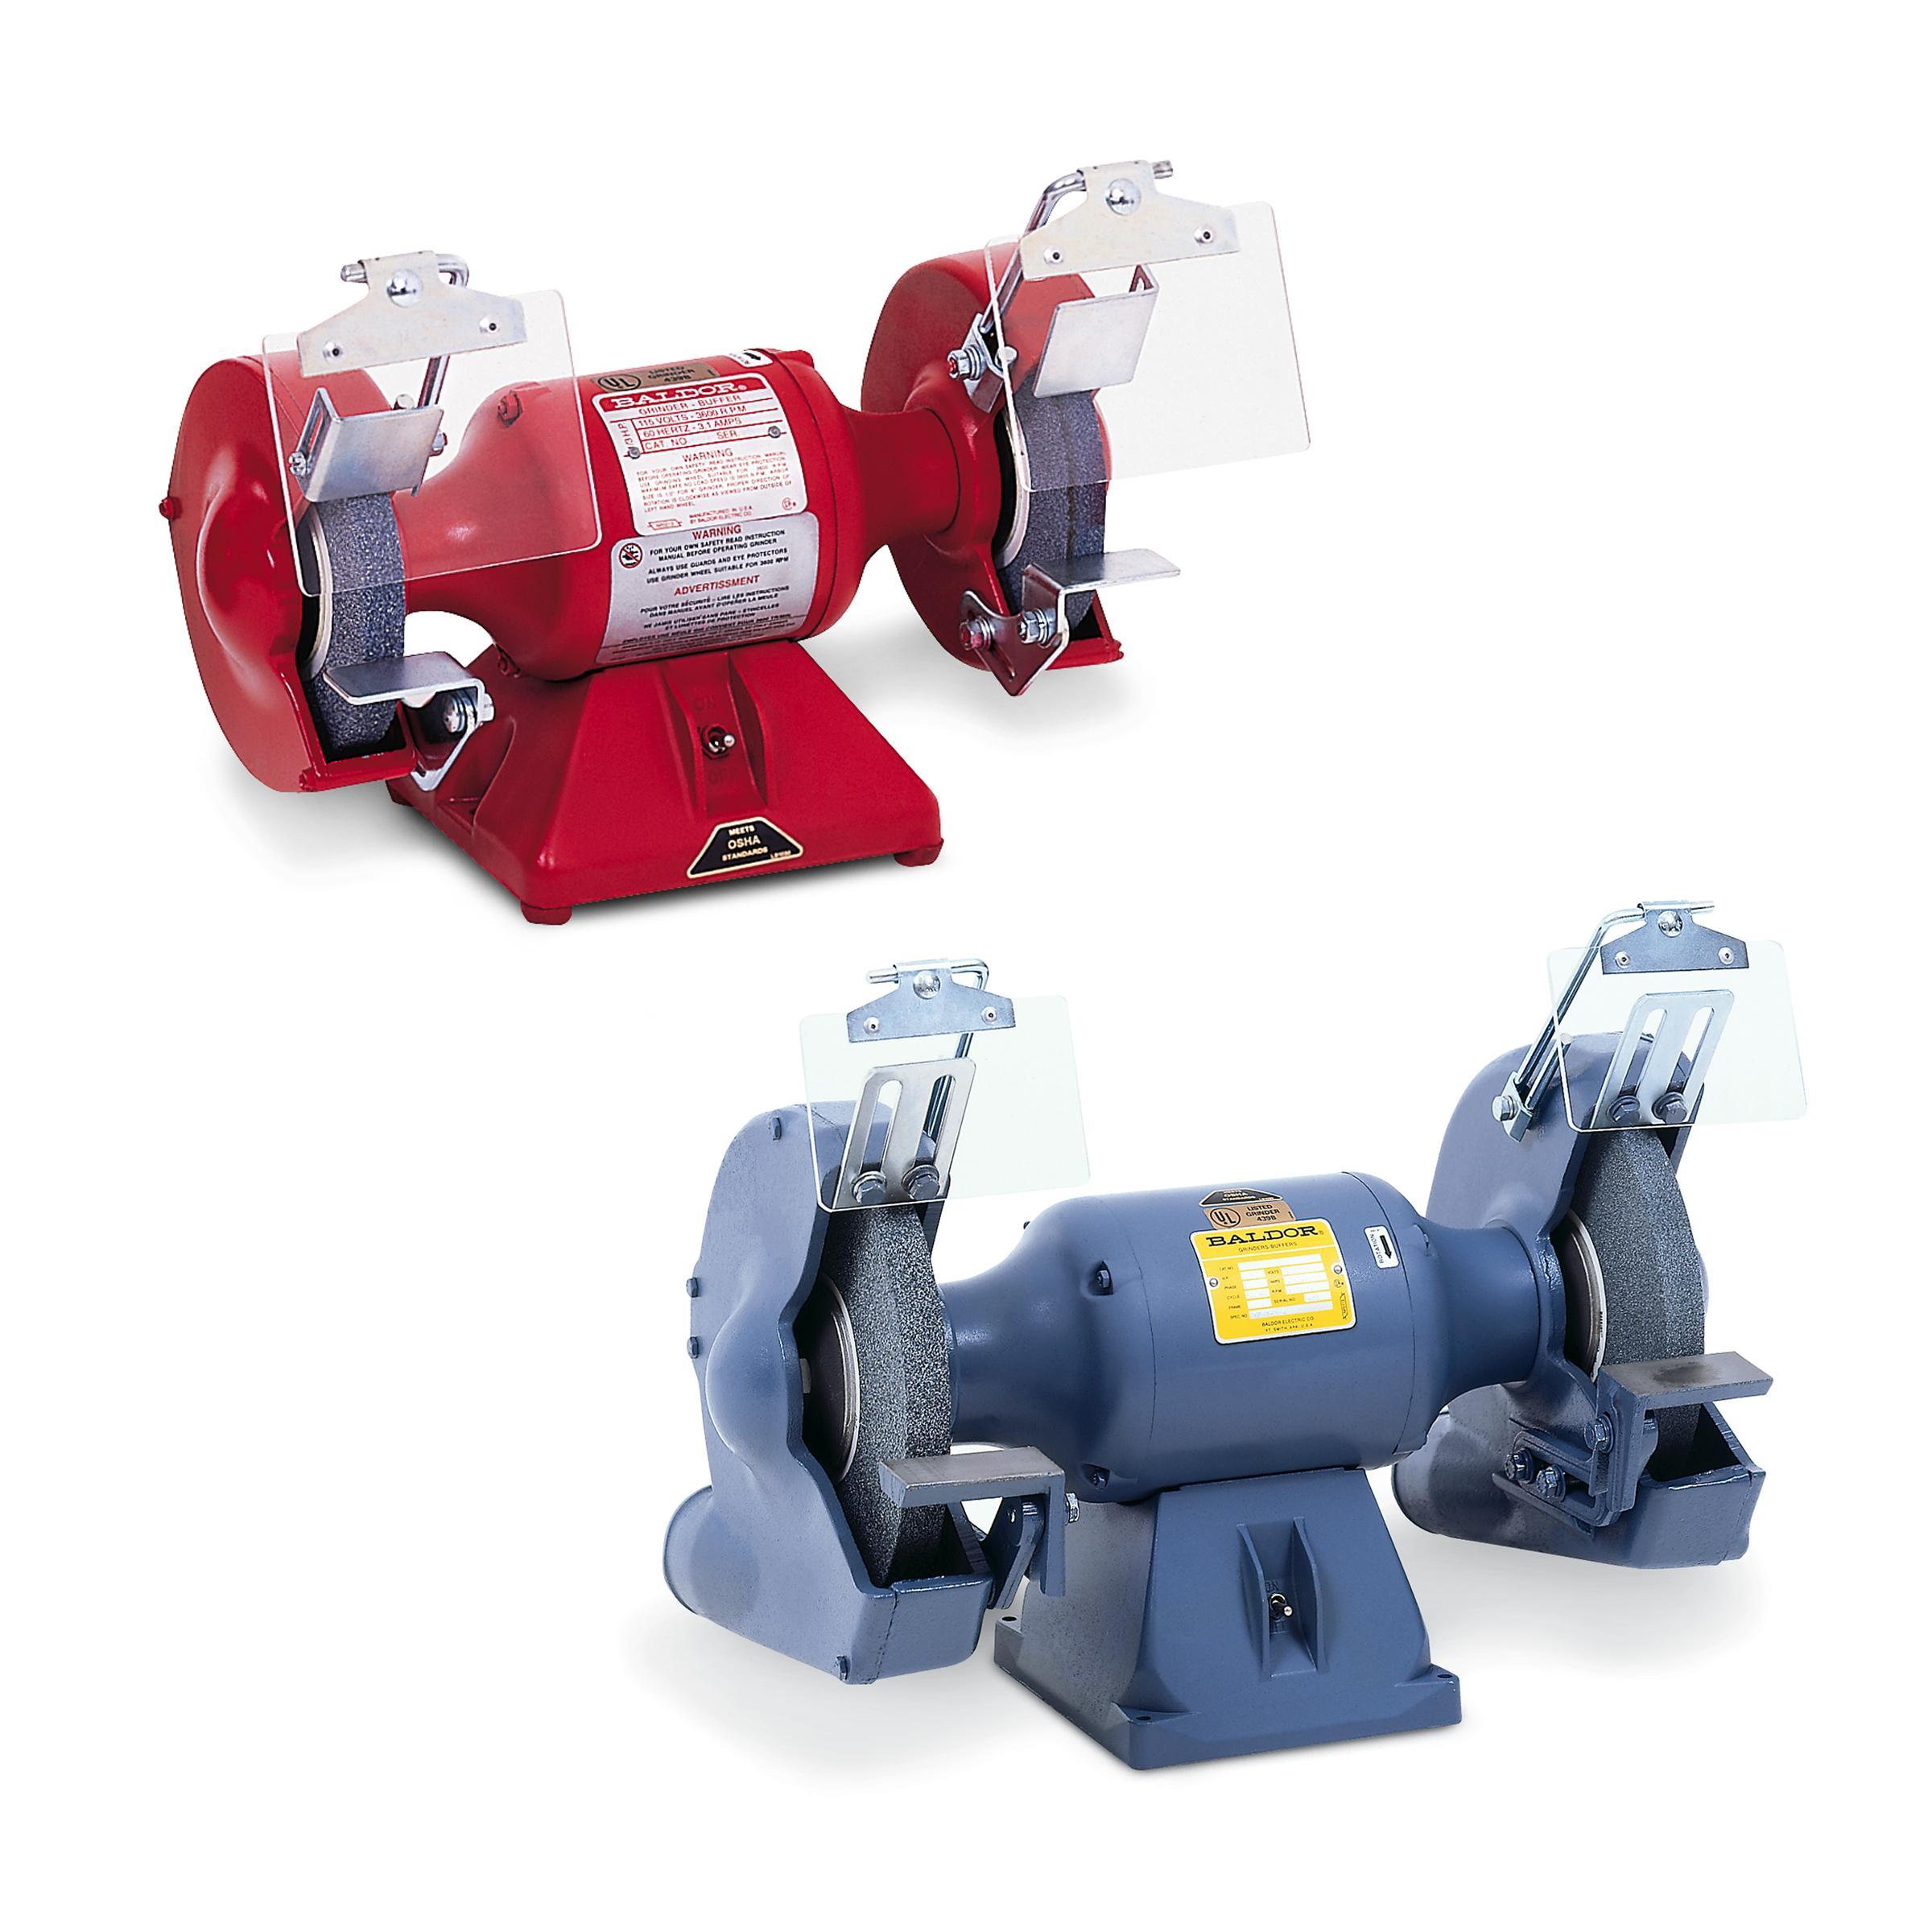 baldor single phase motor wiring diagram grow room ventilation grinders com